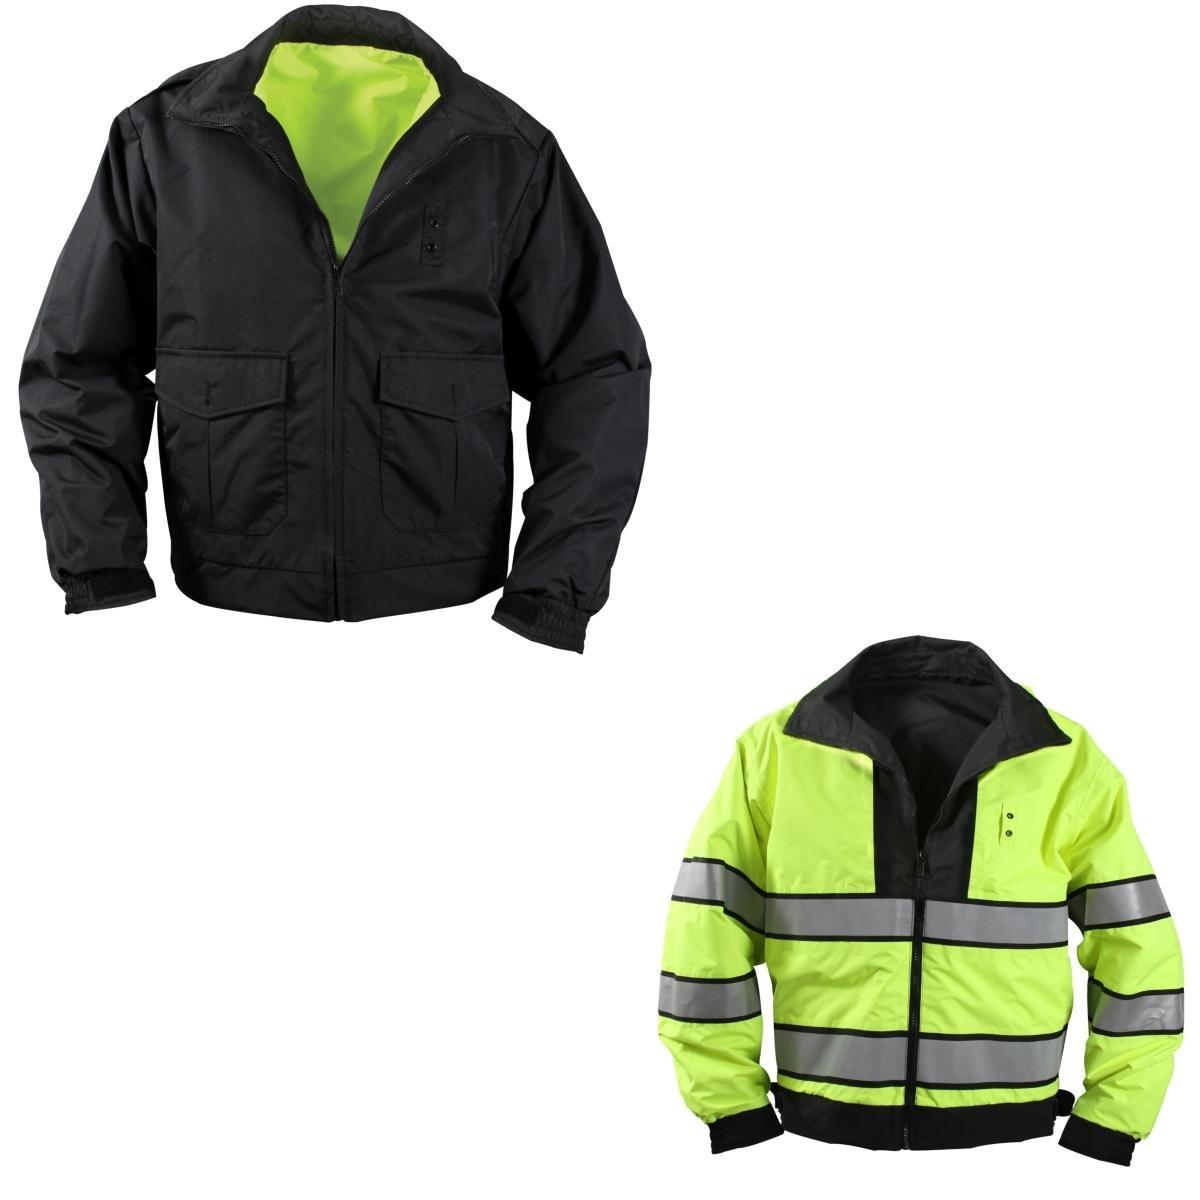 Rothco Reversible Hi-Visibility Uniform Jacket, X-Large by Rothco